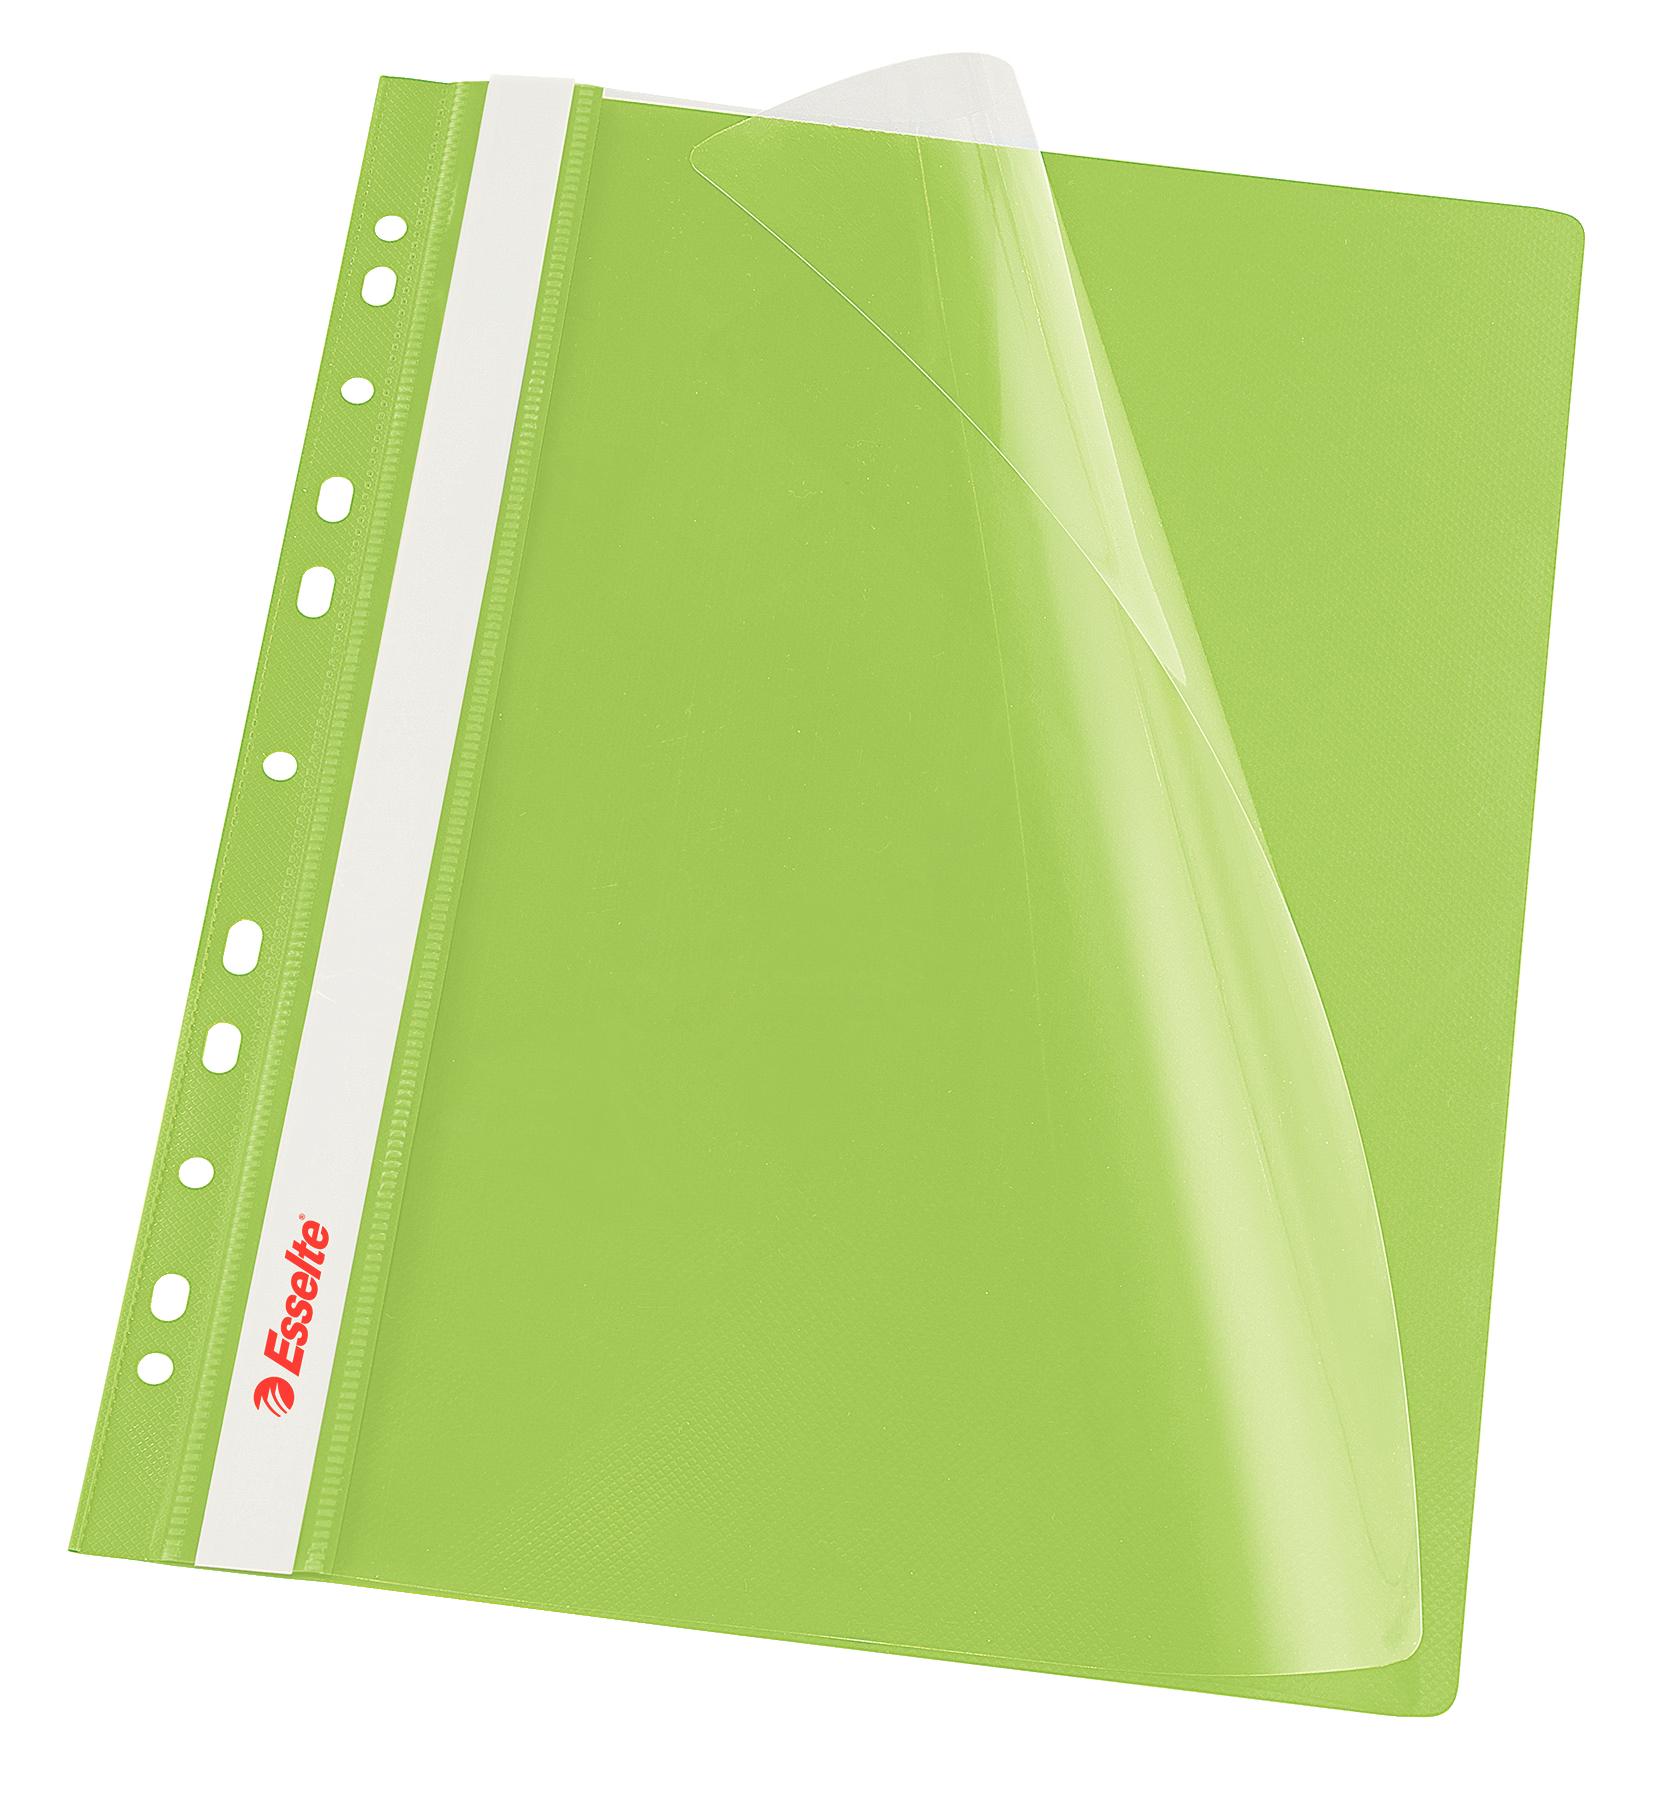 Dosar PP, cu sina si multiperforatii, ESSELTE Vivida, A4, 10 buc/set - verde